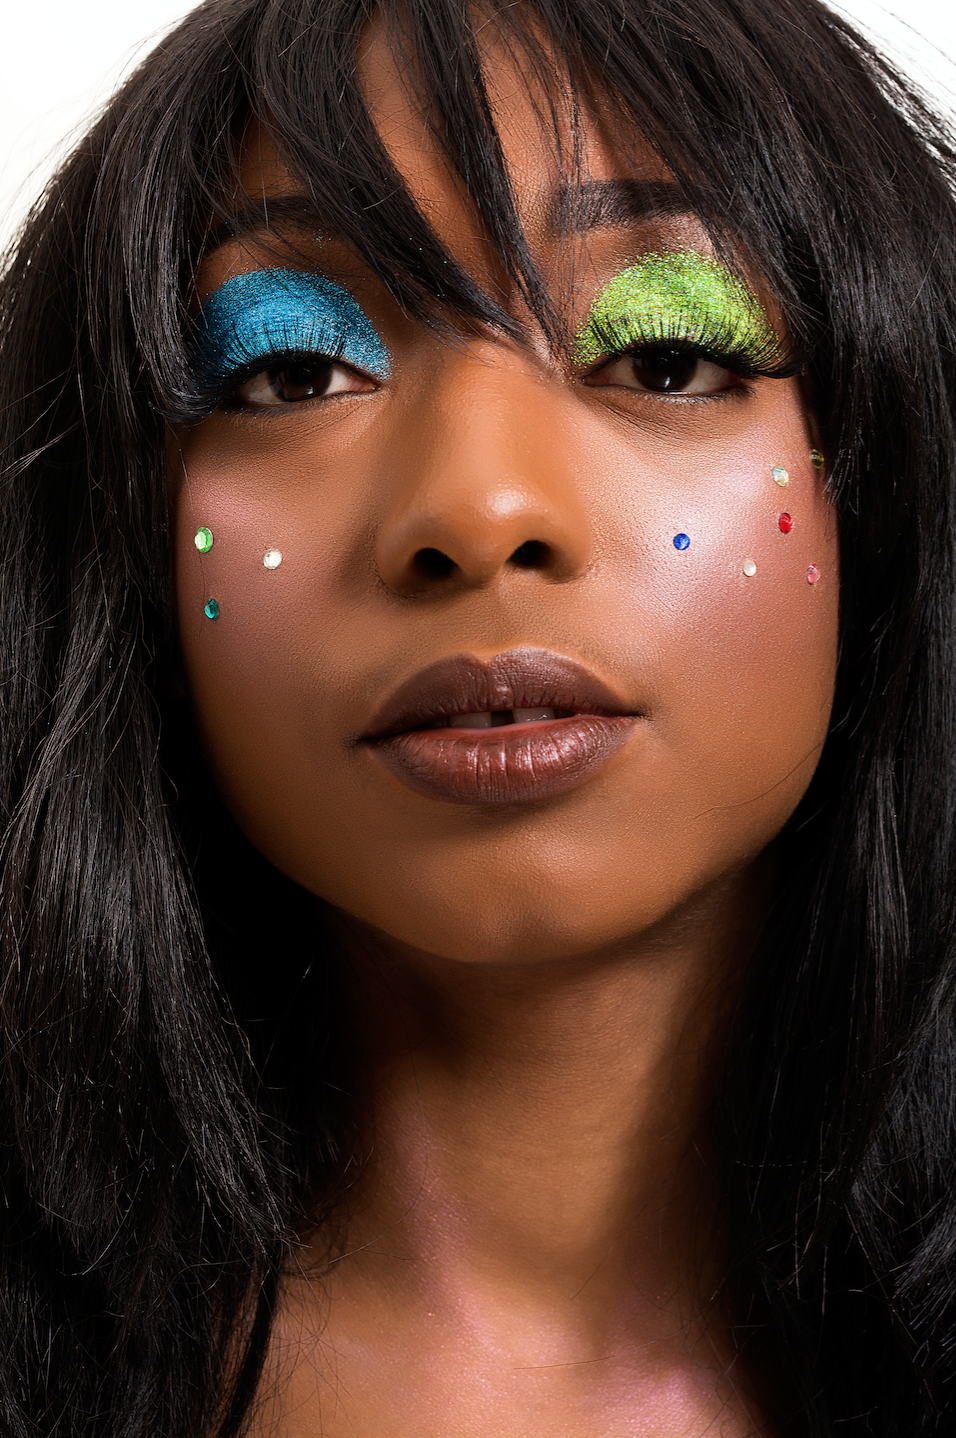 "Makeup used:Lips: MAC ""Diggin It,""Glitter:J.cat Beauty Mineral Base Loose Powder Sparkling Eye Shadow Pigment Blush: Janel Cosmetics,Lashes: BeBella #100, Body Highlight: Anastasia Aurora Glow kit."